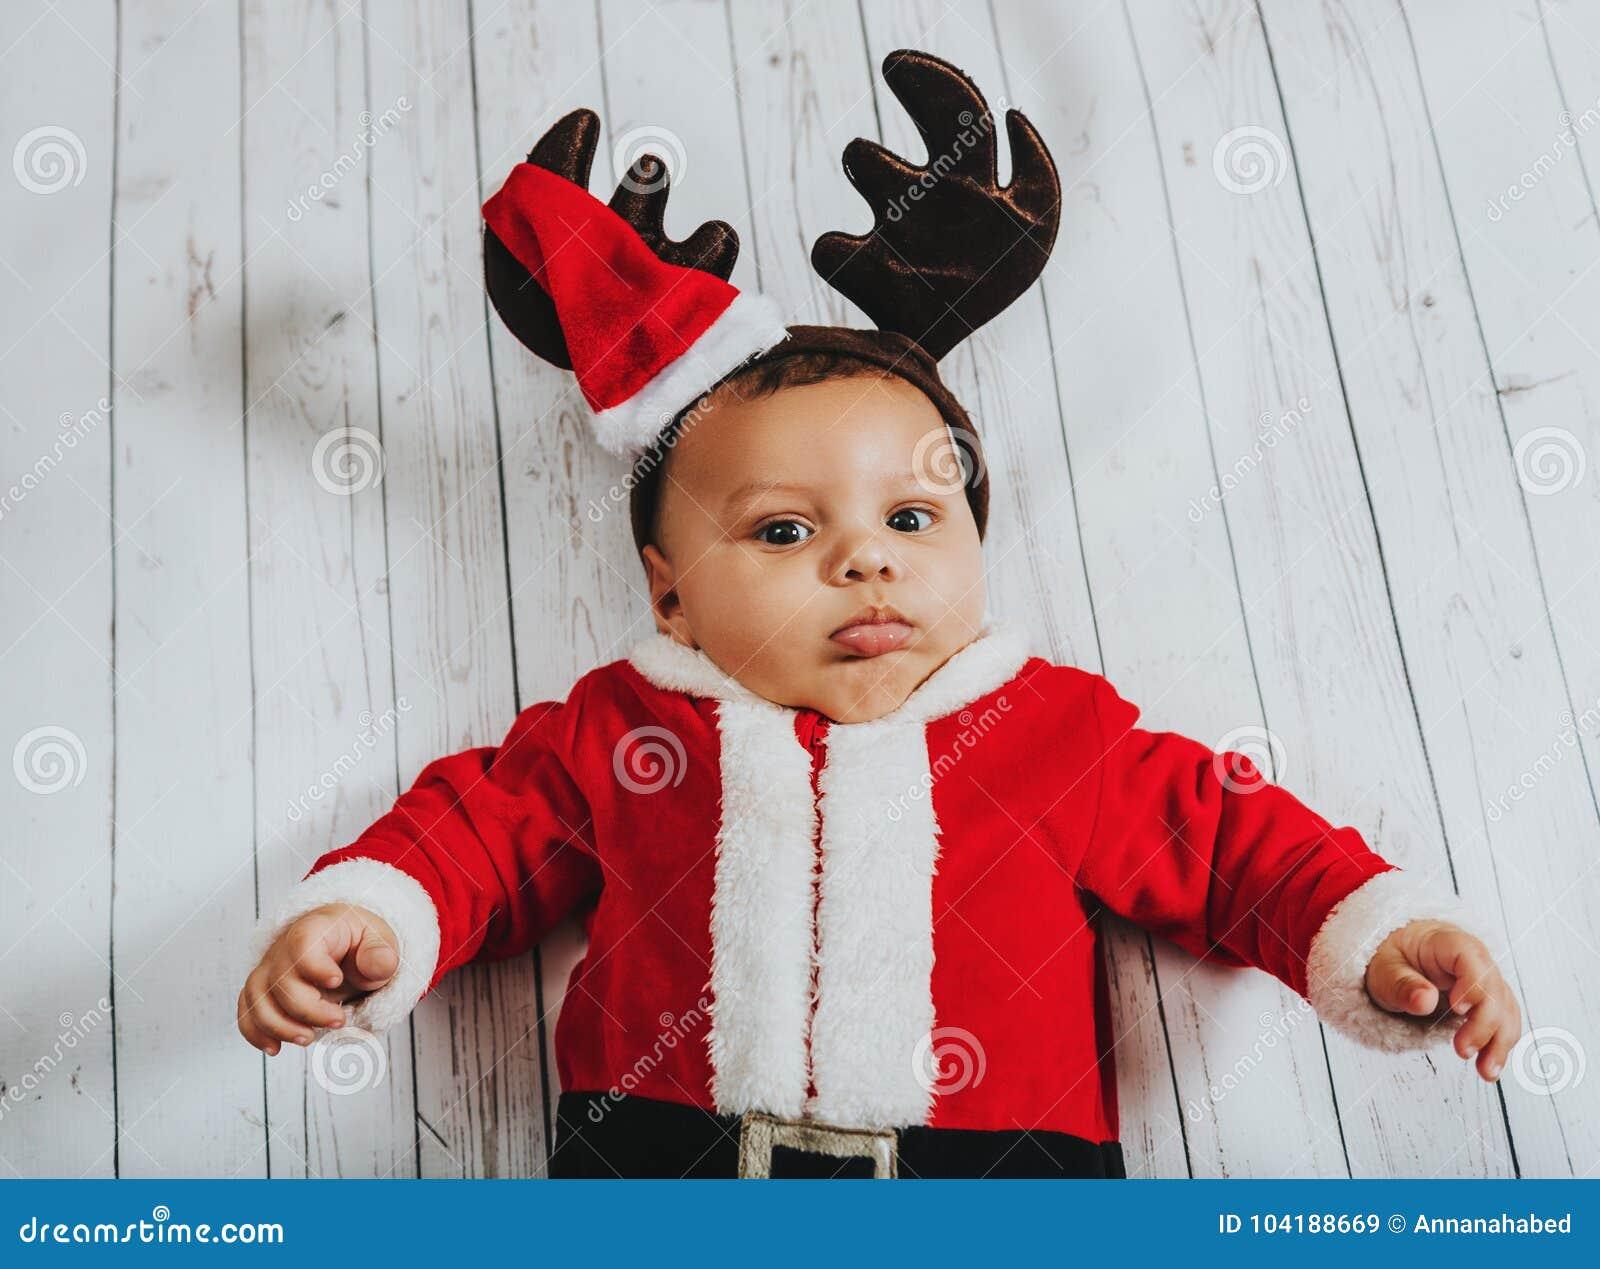 f5837c1ba Christmas Portrait Of Adorable Newborn Baby Wearing Santa Claus ...